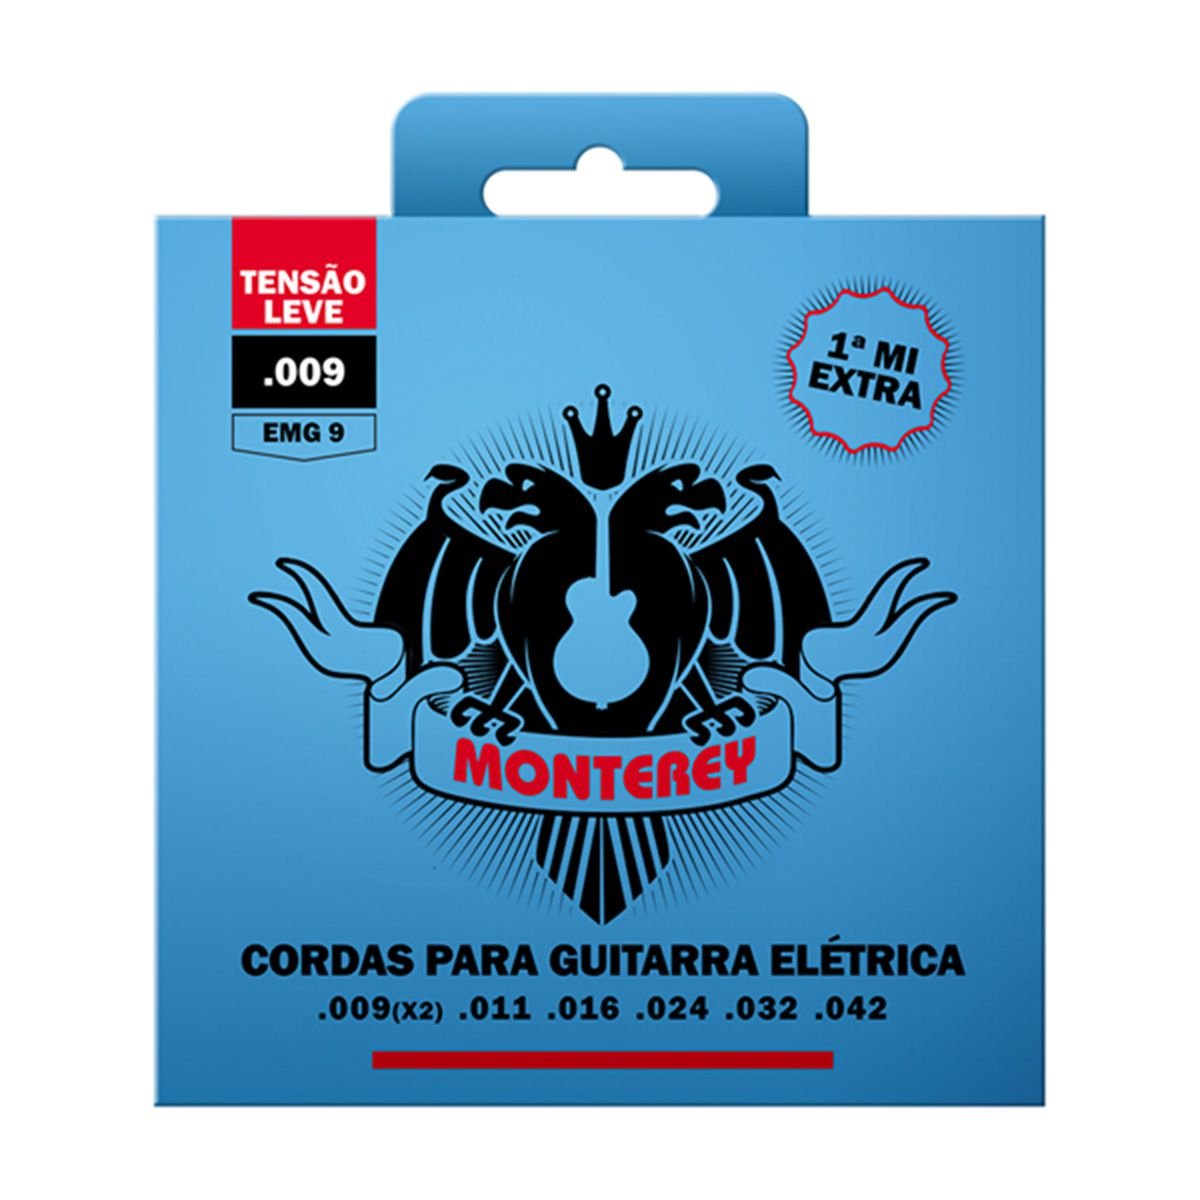 Jogo de Cordas p/ Guitarra 009 - Monterey (1 Corda Mi Extra)